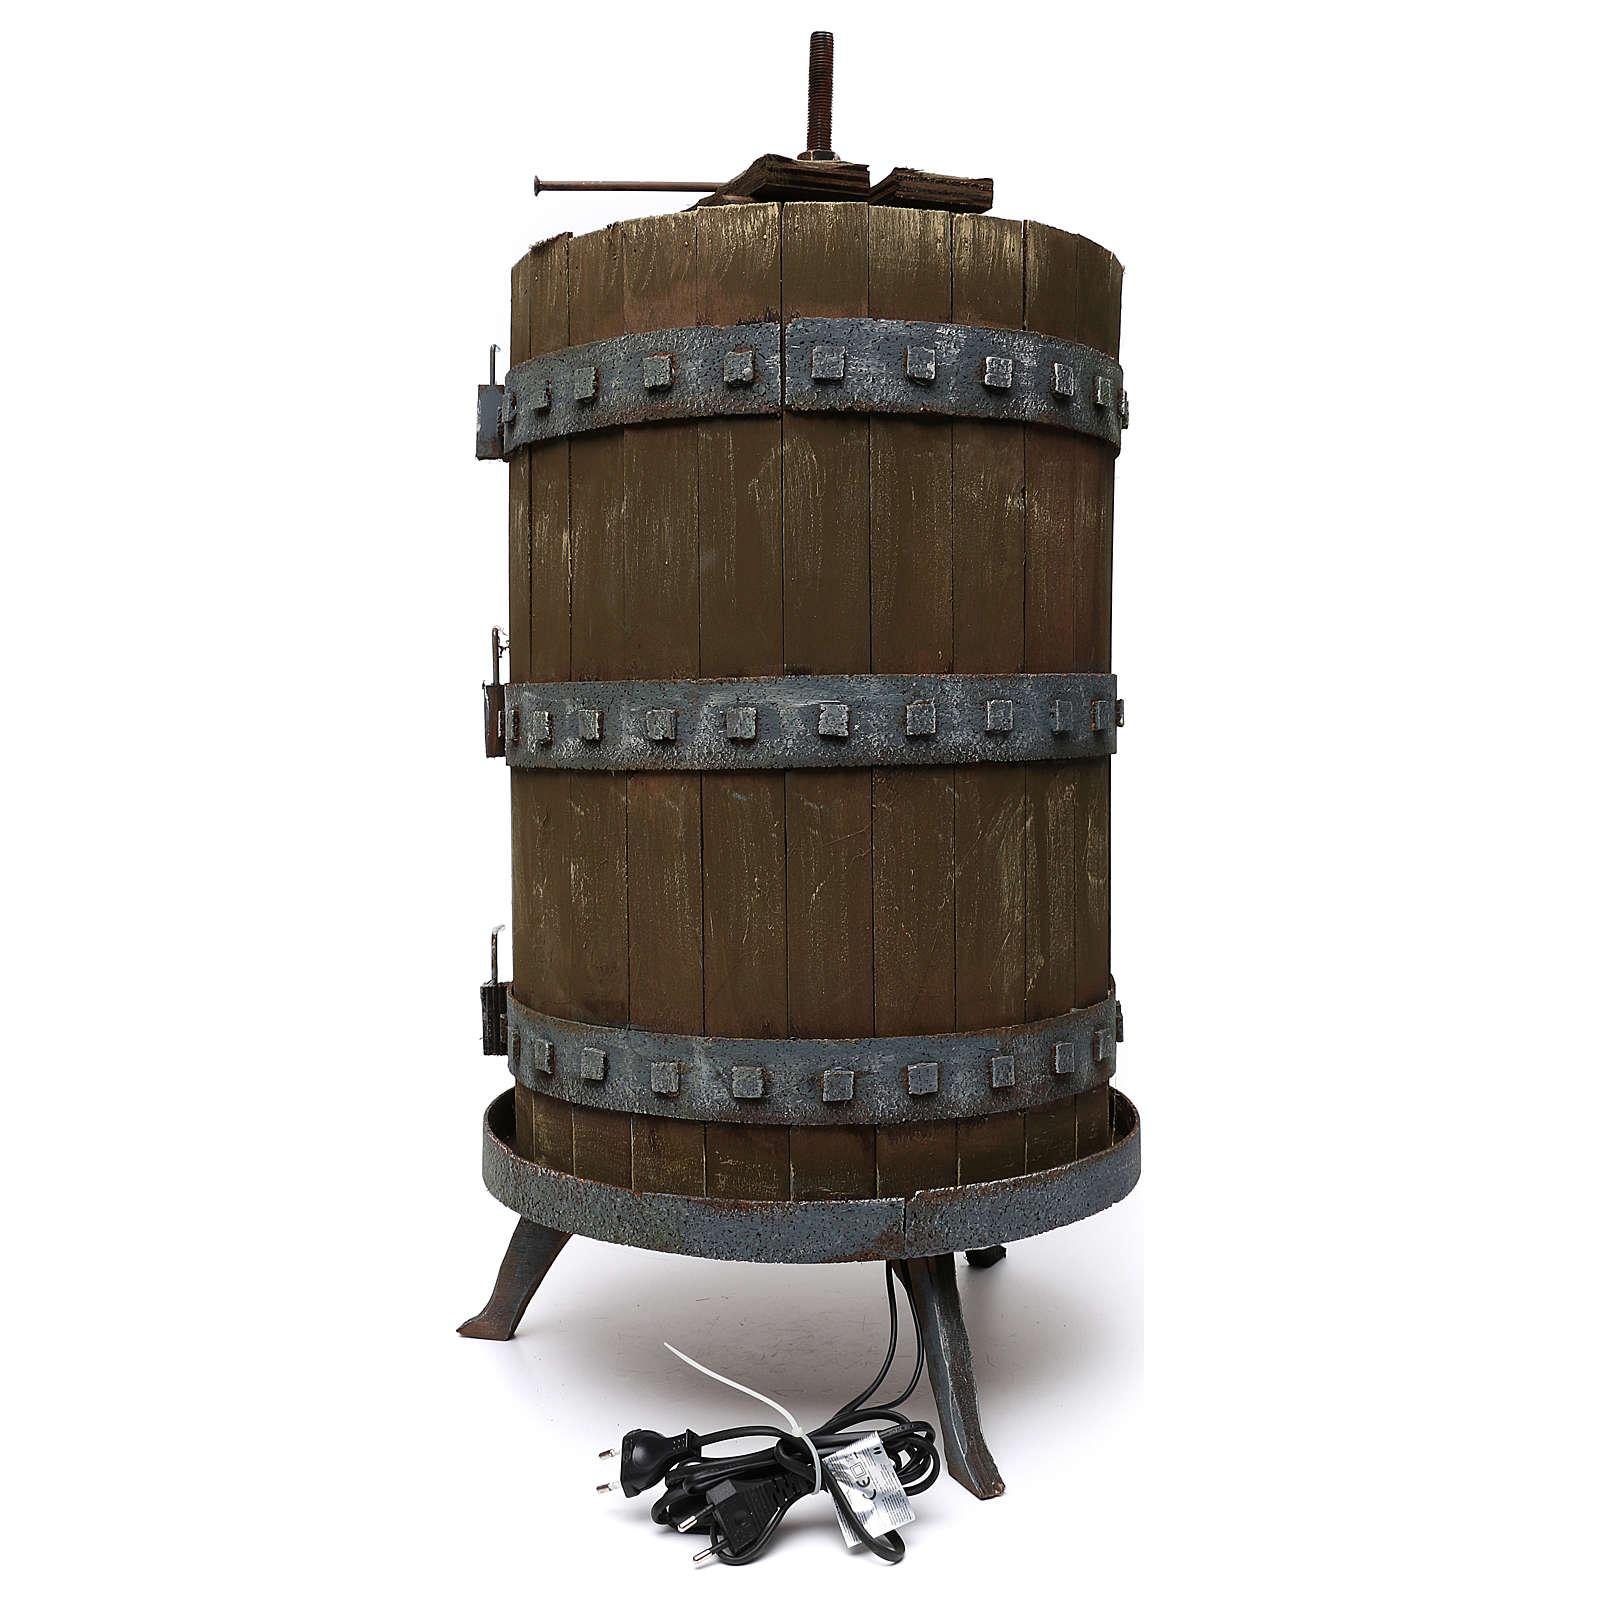 Torchio vinario illuminato 85x45 cm presepe illuminato per statuine 6 cm 4